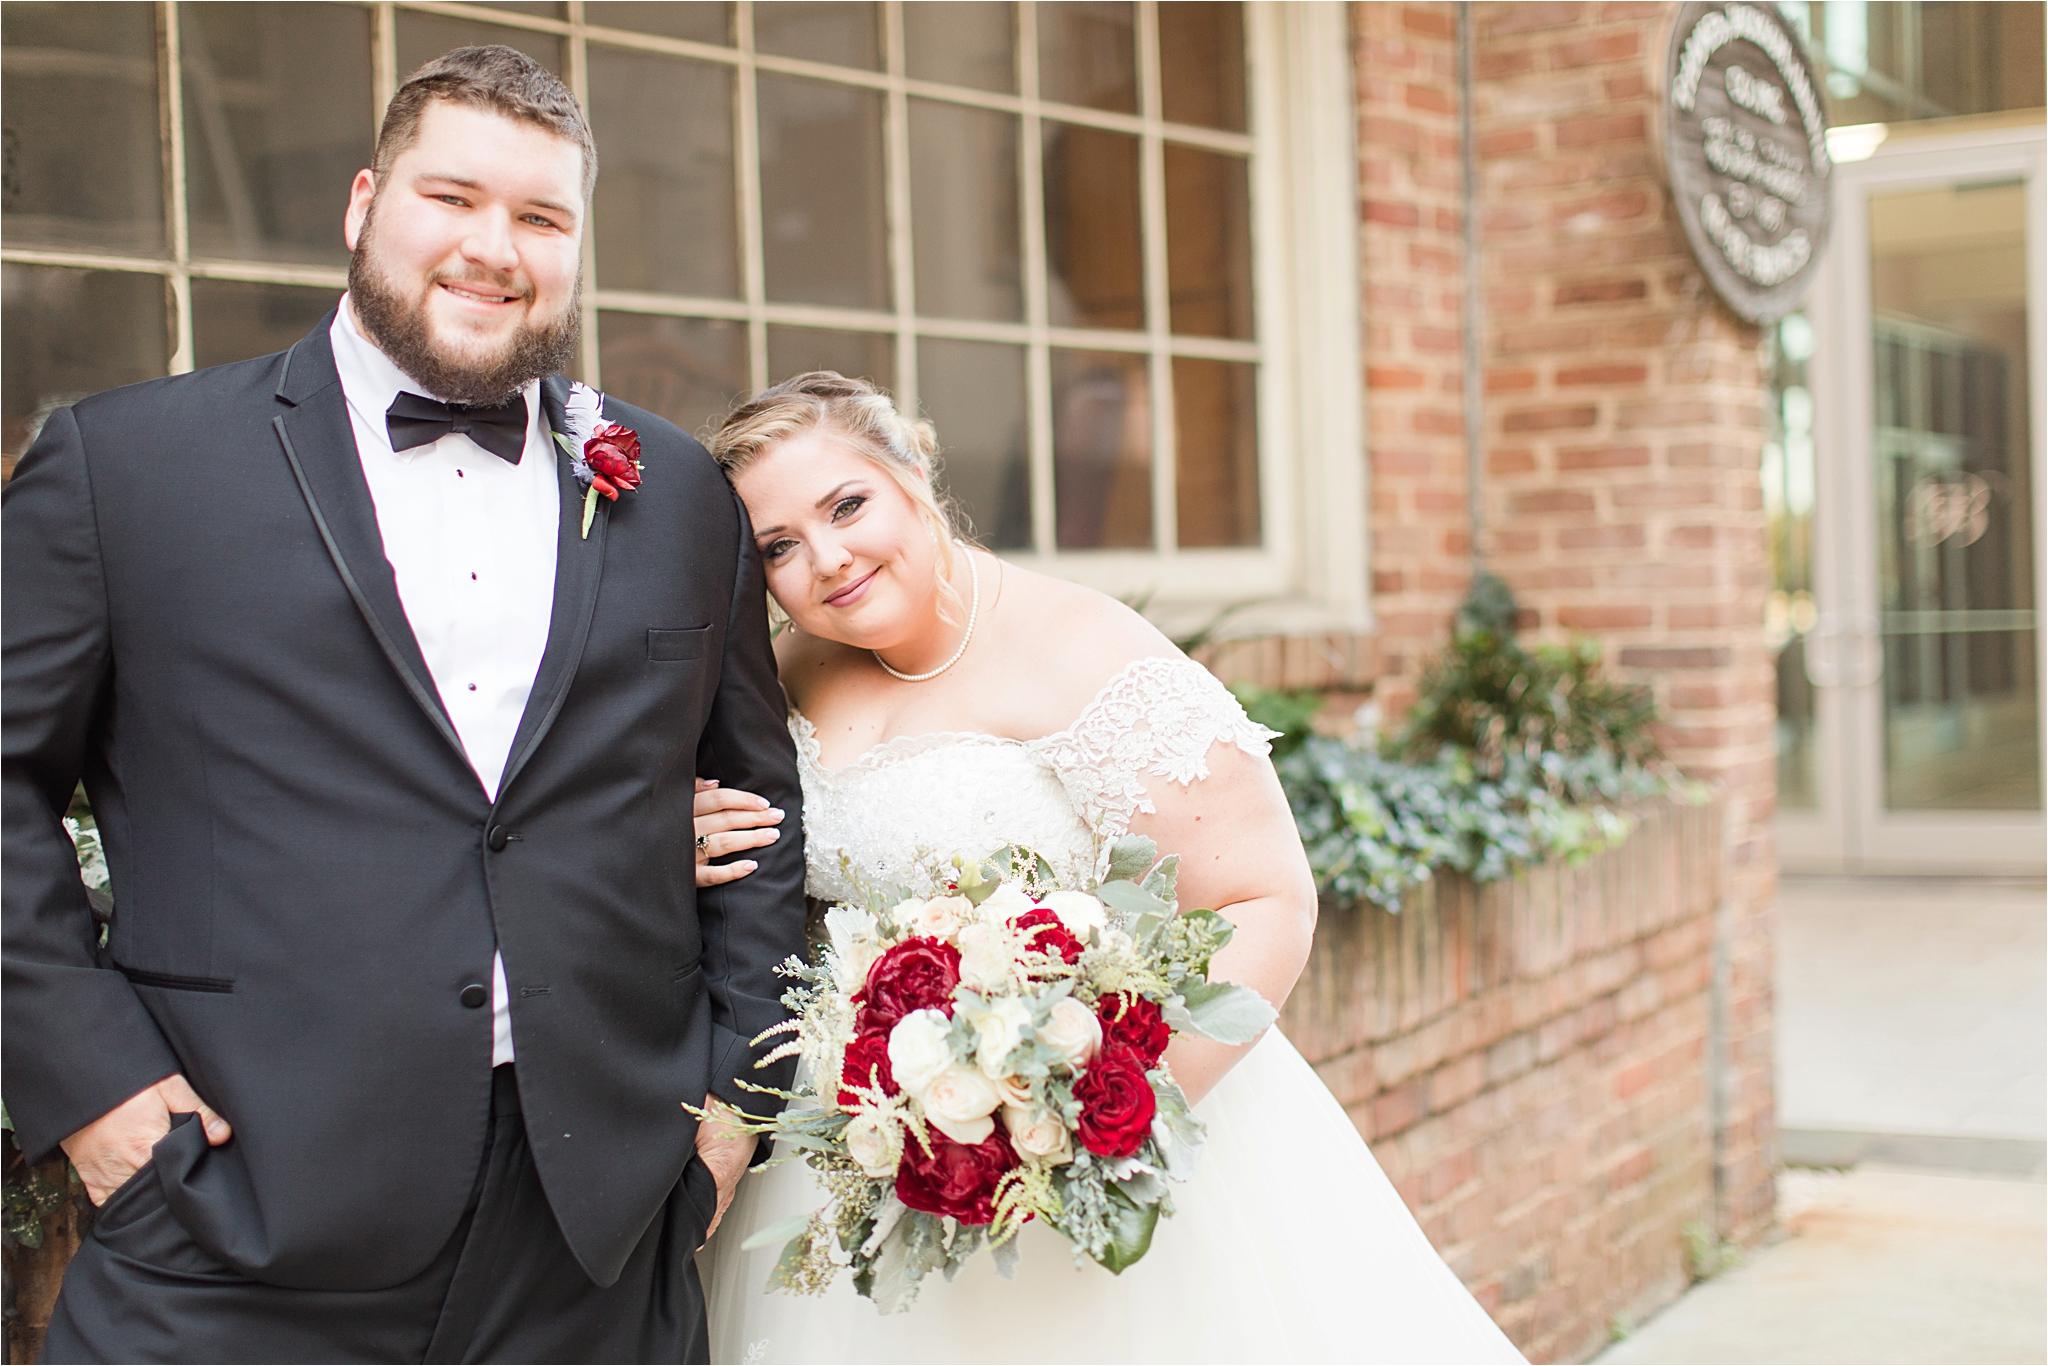 Cranberry and Blush Winter Wedding   Kevin + Samantha